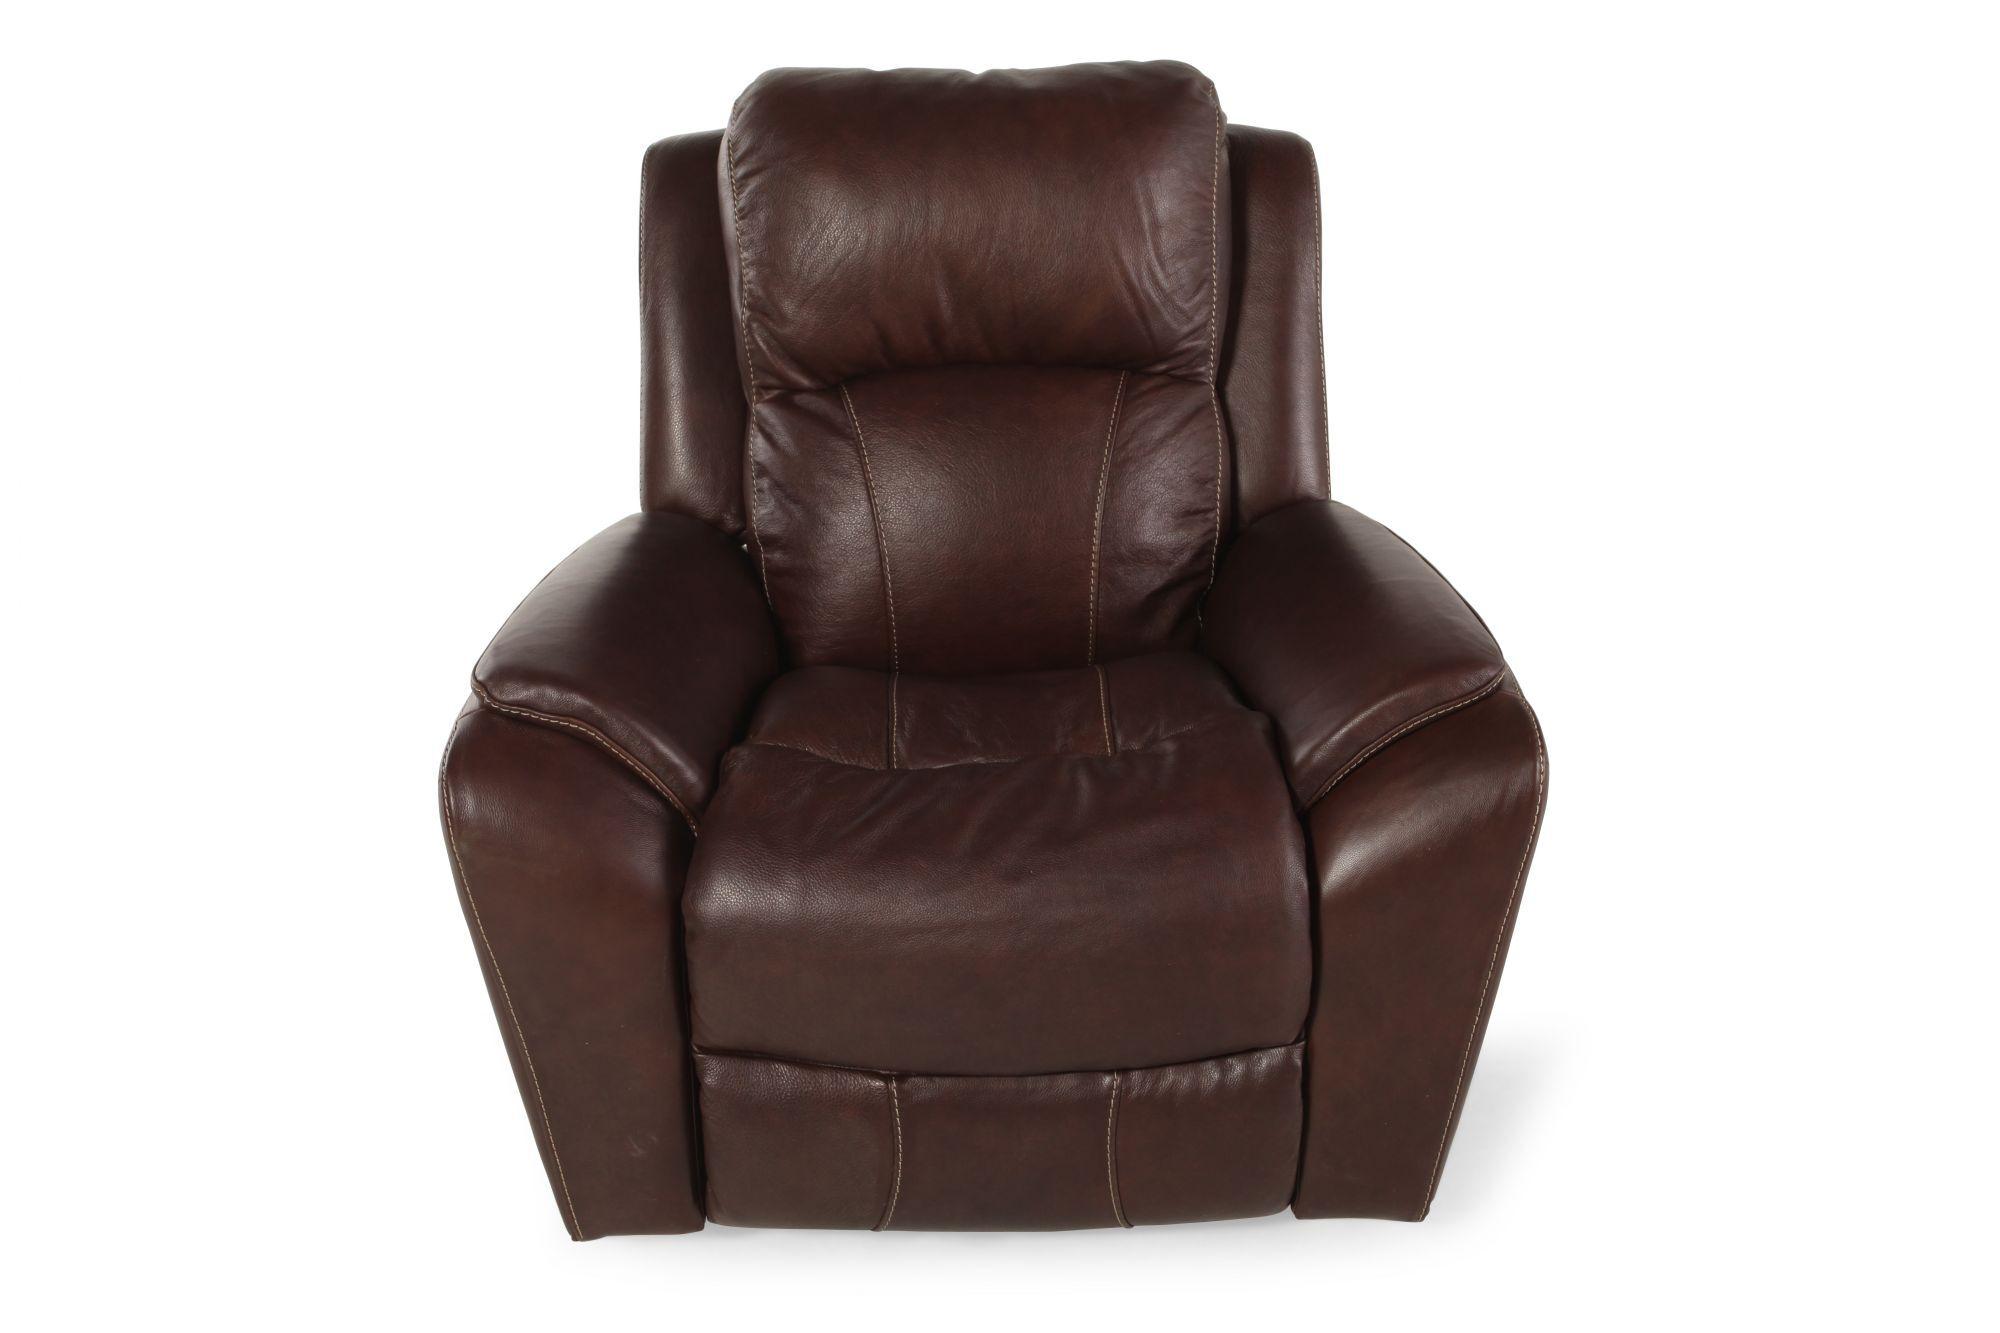 La-Z-Boy Barrett Cocoa Rocker Recliner ...  sc 1 st  Mathis Brothers & La-Z-Boy Furniture | Mathis Brothers Furniture islam-shia.org